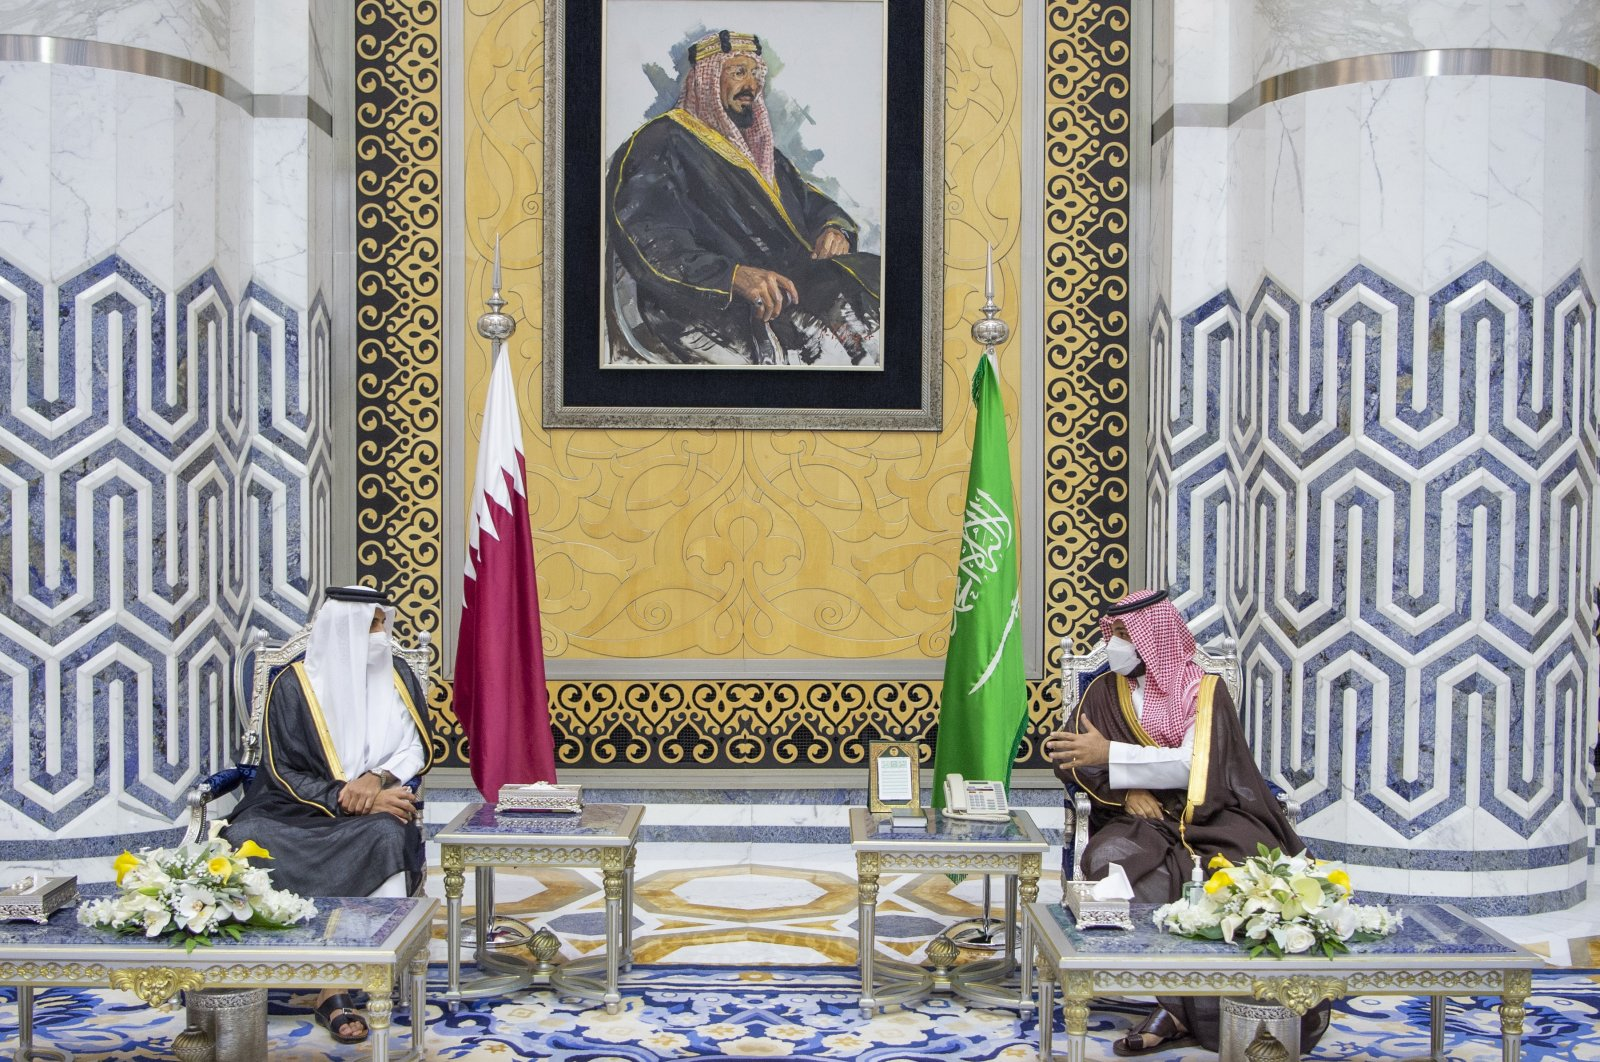 Saudi Crown Prince Mohammed bin Salman (R) meets with Qatar's Emir Sheikh Tamim bin Hamad Al Thani in the Red Sea city of Jiddah, Saudi Arabia, May 10, 2021. (Saudi Royal Palace via AP)